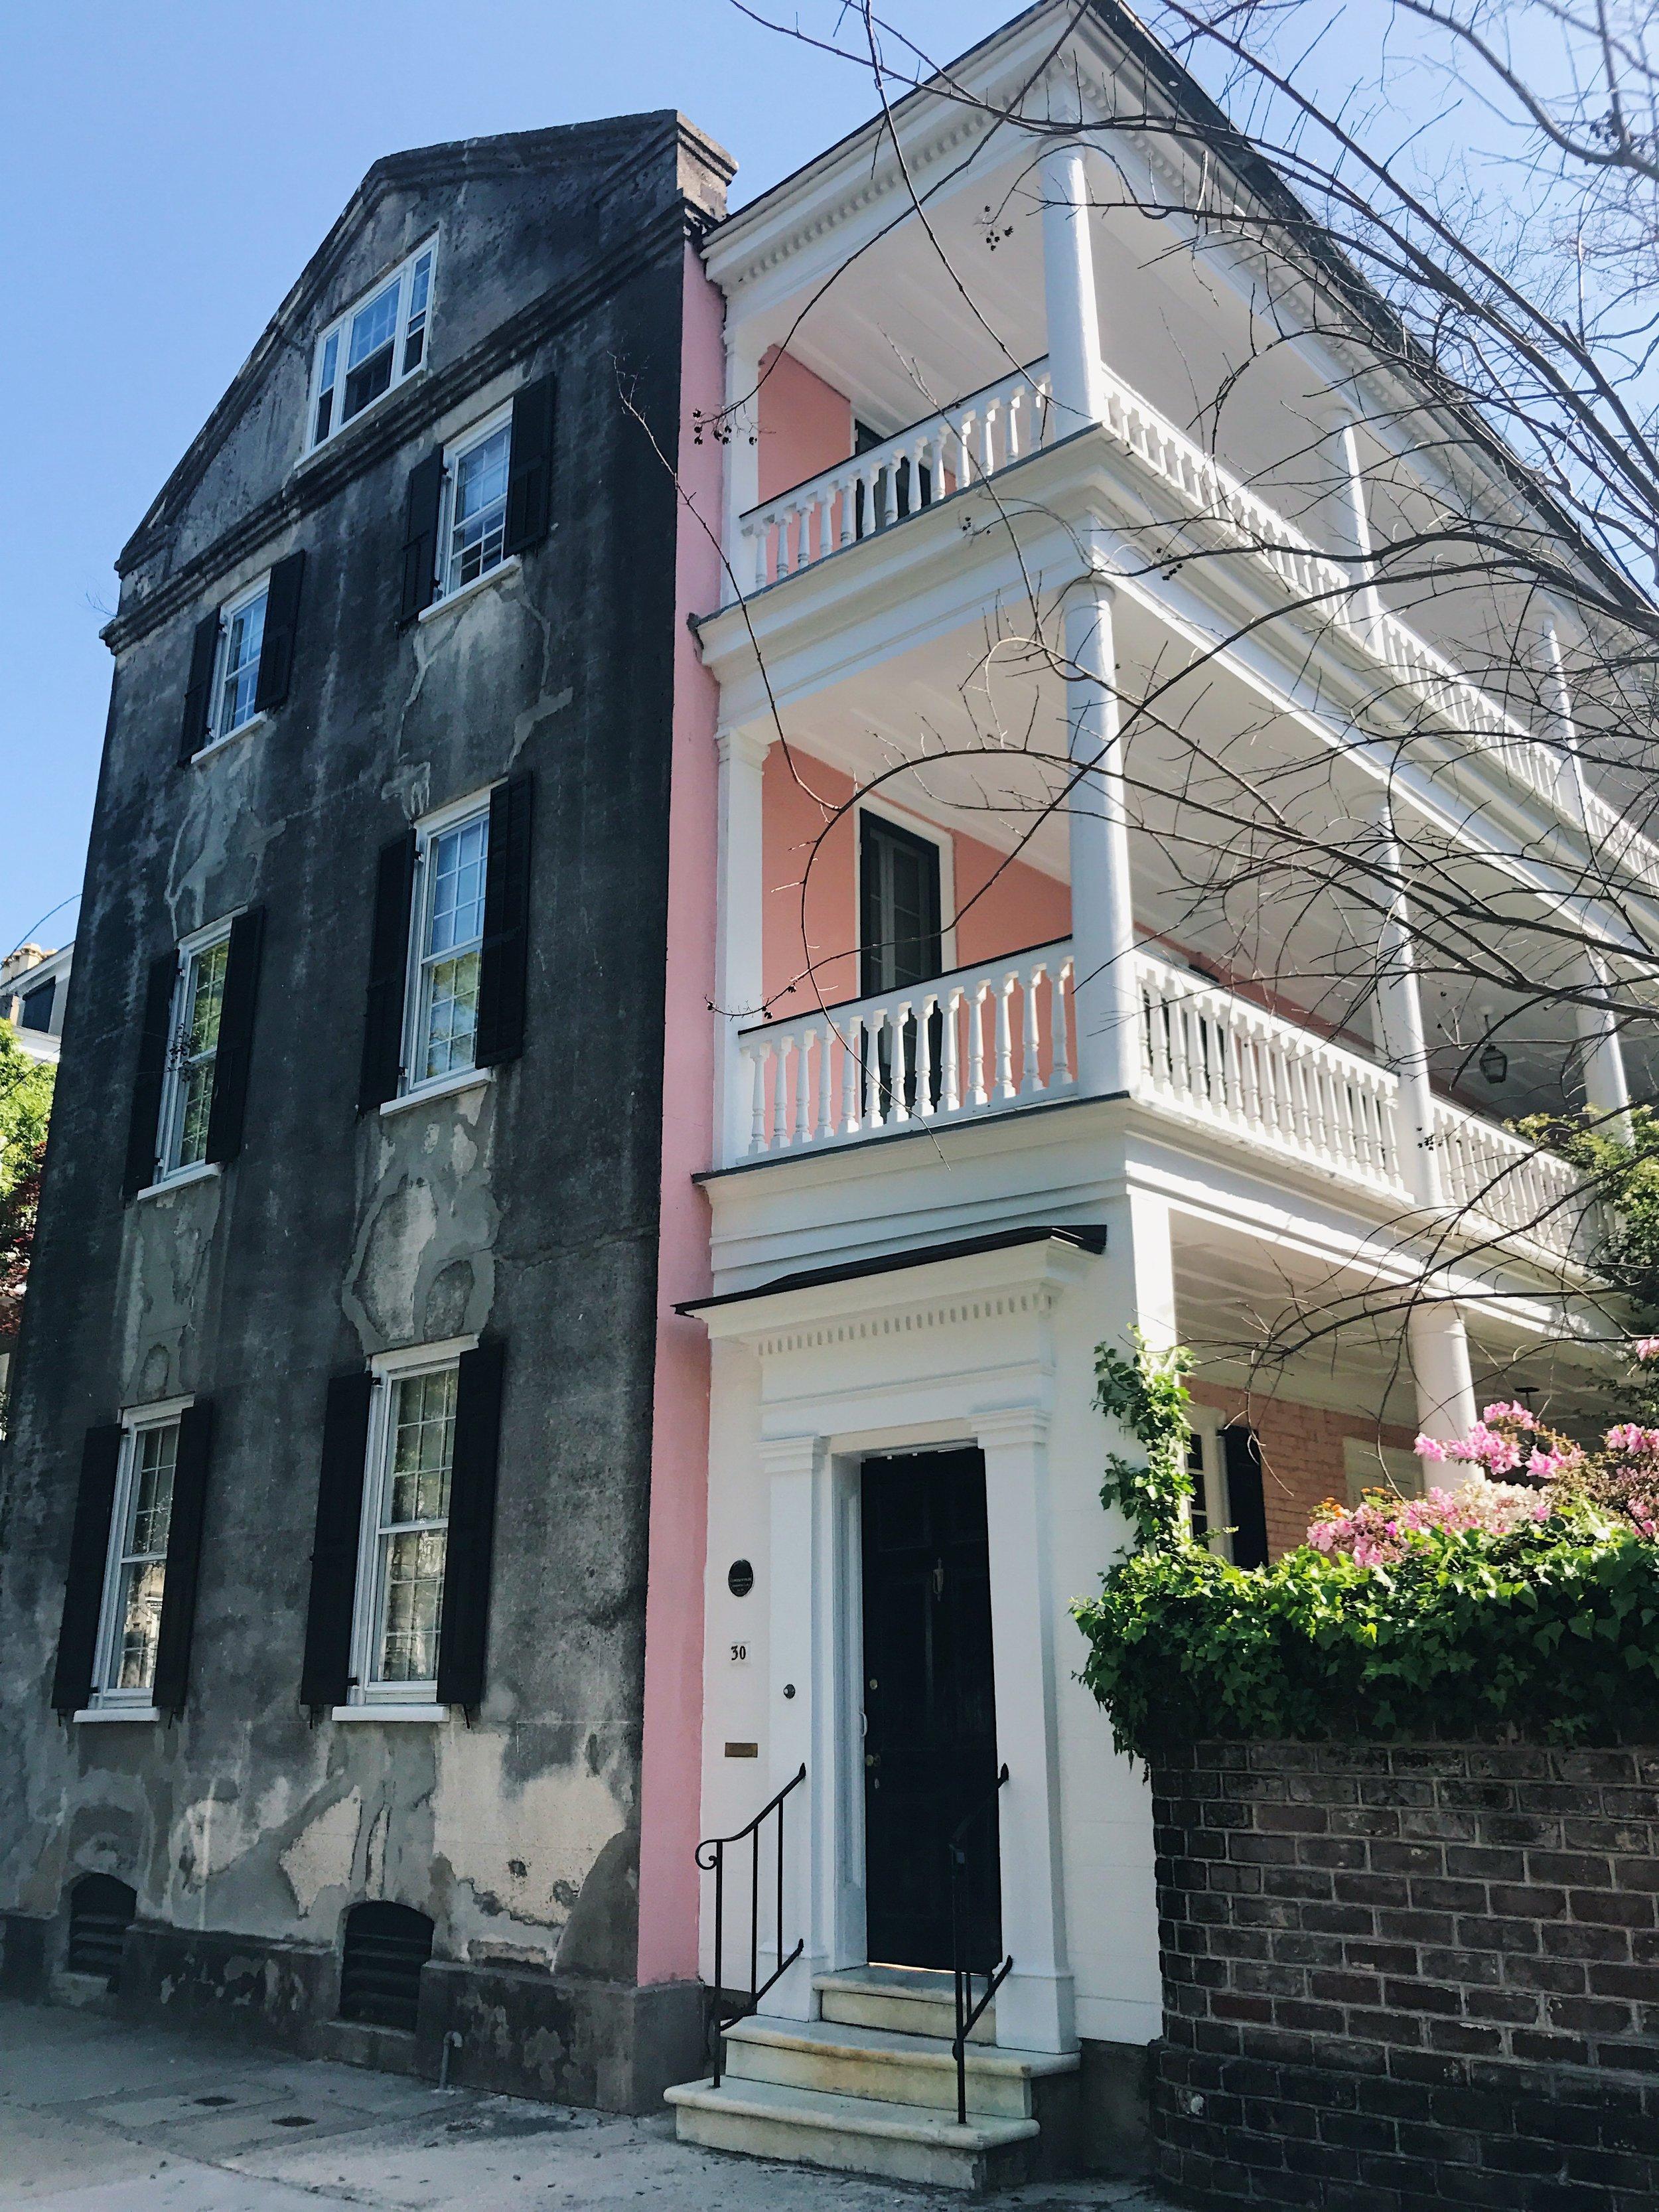 Architecture of Charleston South Carolina